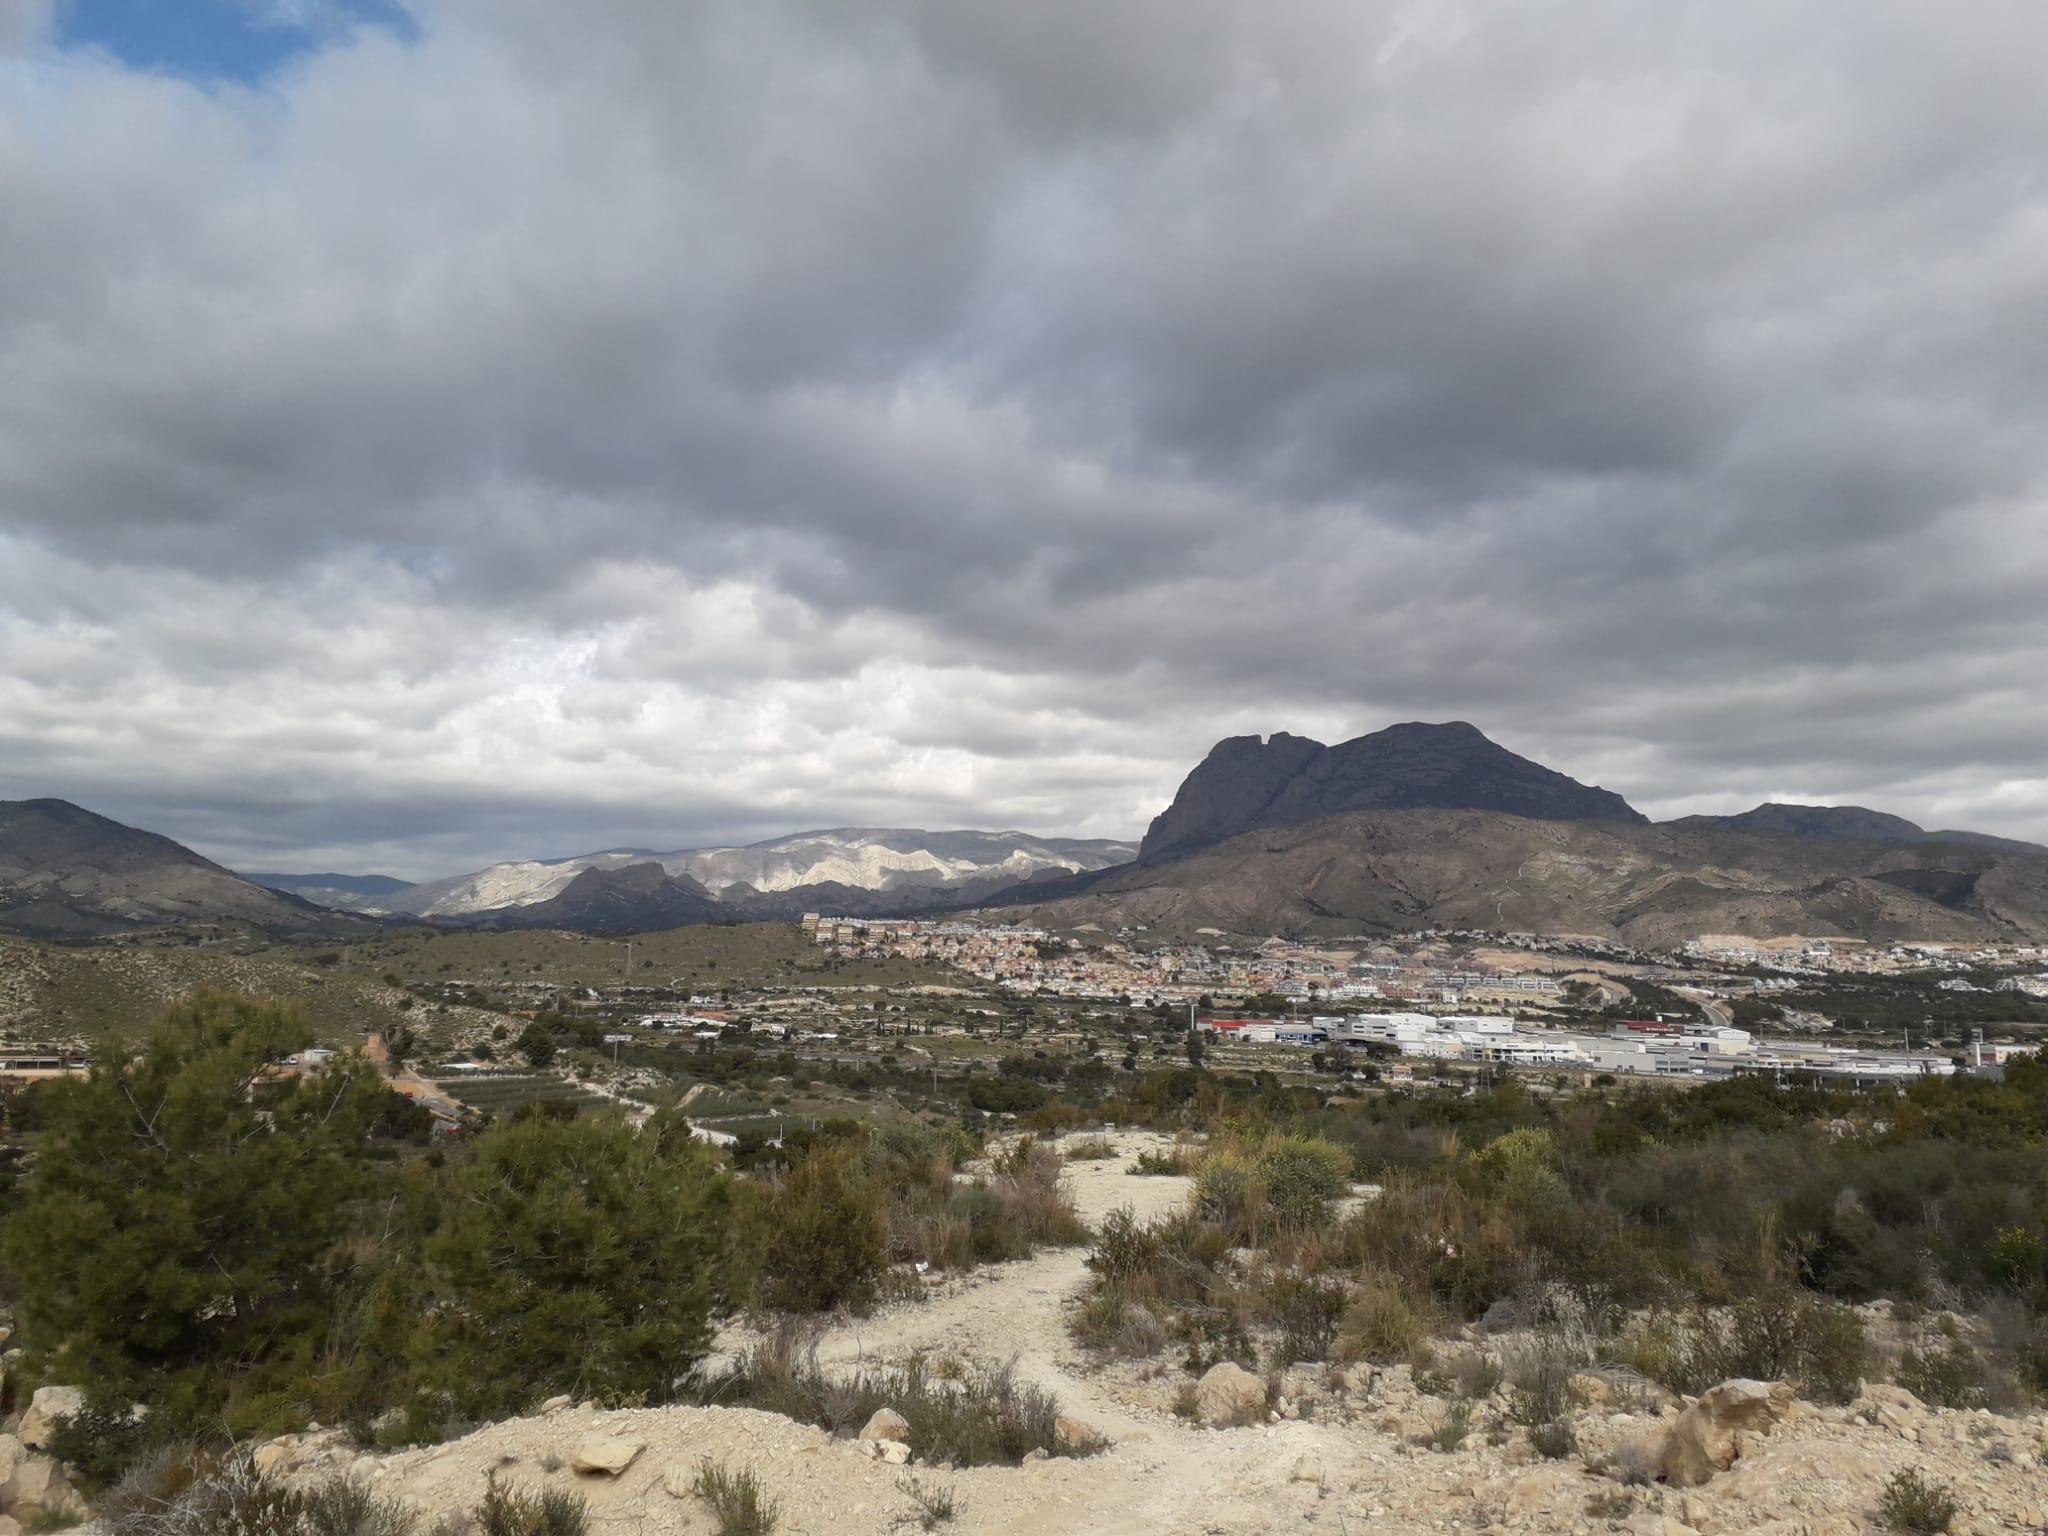 Puig Campana 1